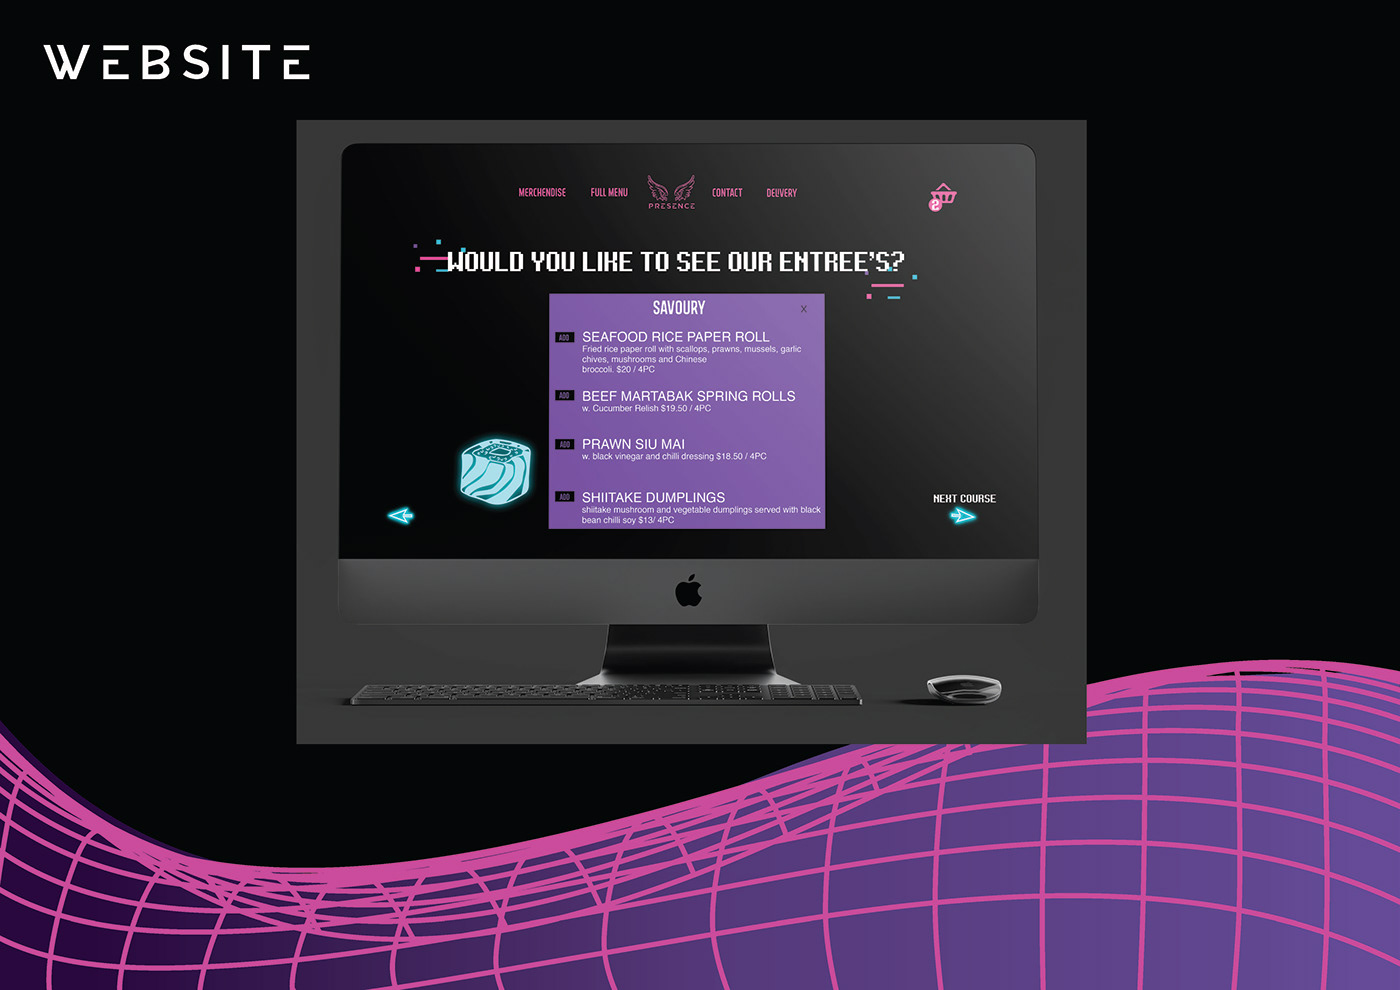 Image may contain: computer monitor and television